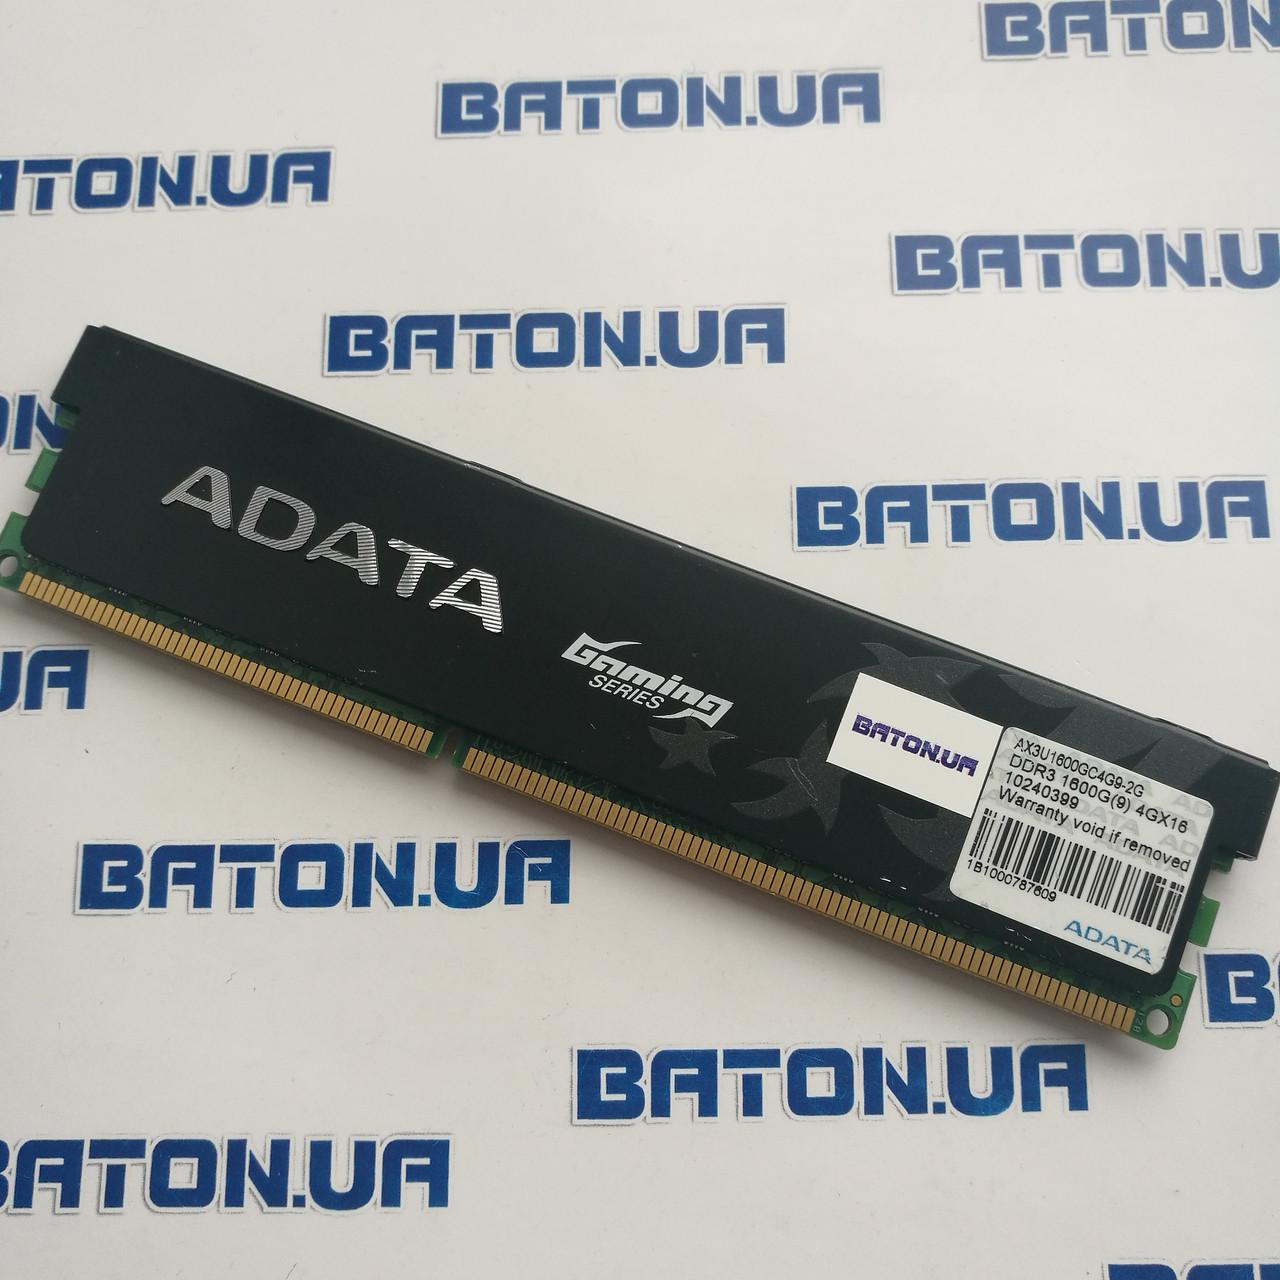 Игровая оперативная память Adata Gaming Series DDR3 4Gb 1600MHz PC3 12800U CL9 (AX3U1600GC4G9-2G)